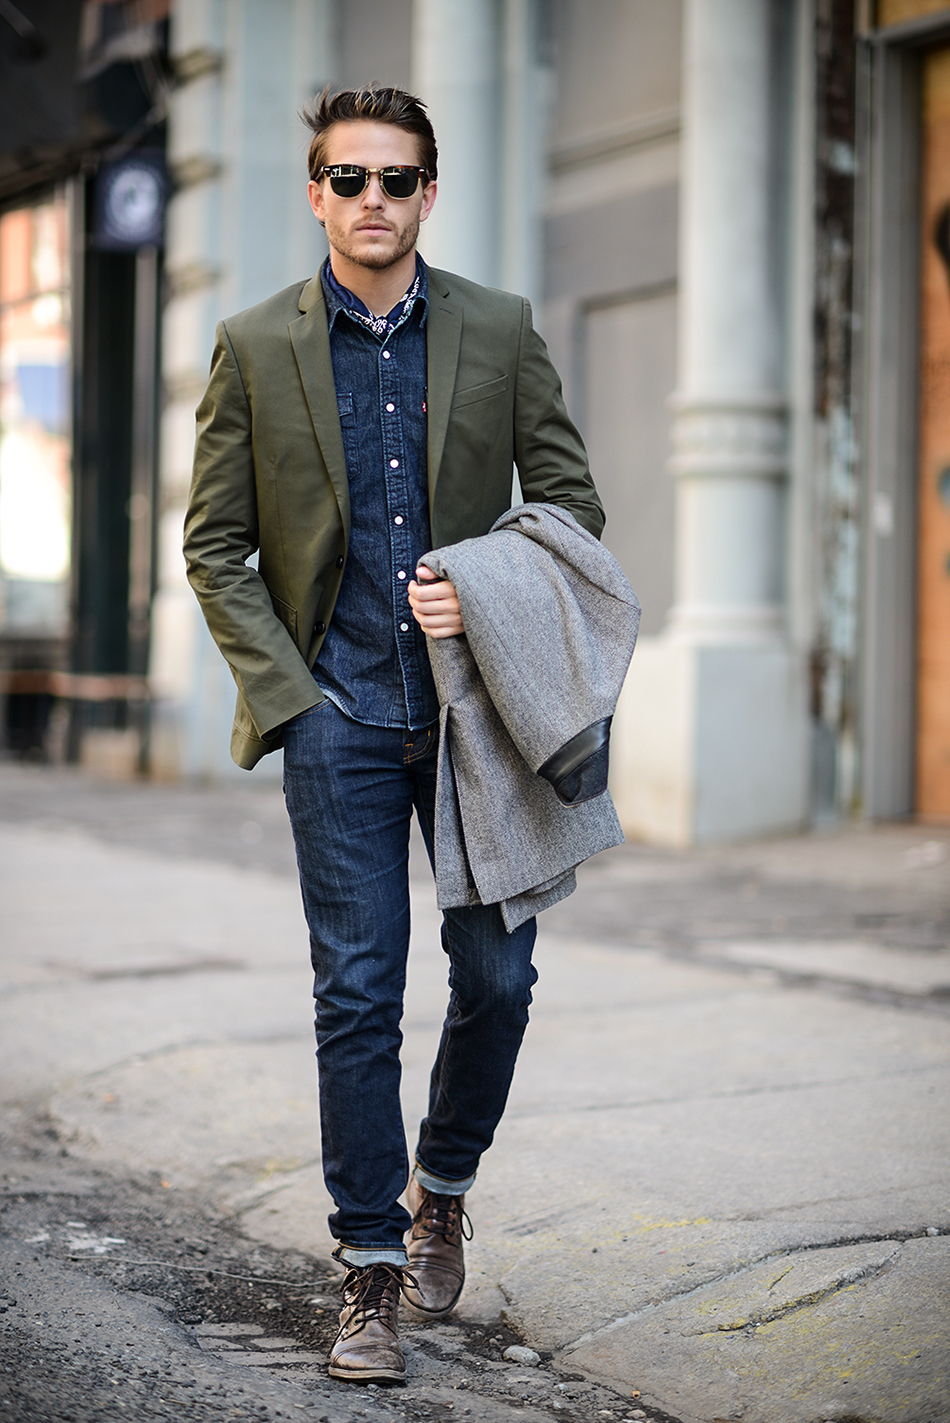 da03aca48ef How To Wear an Olive Blazer With Navy Skinny Jeans For Men (8 looks ...